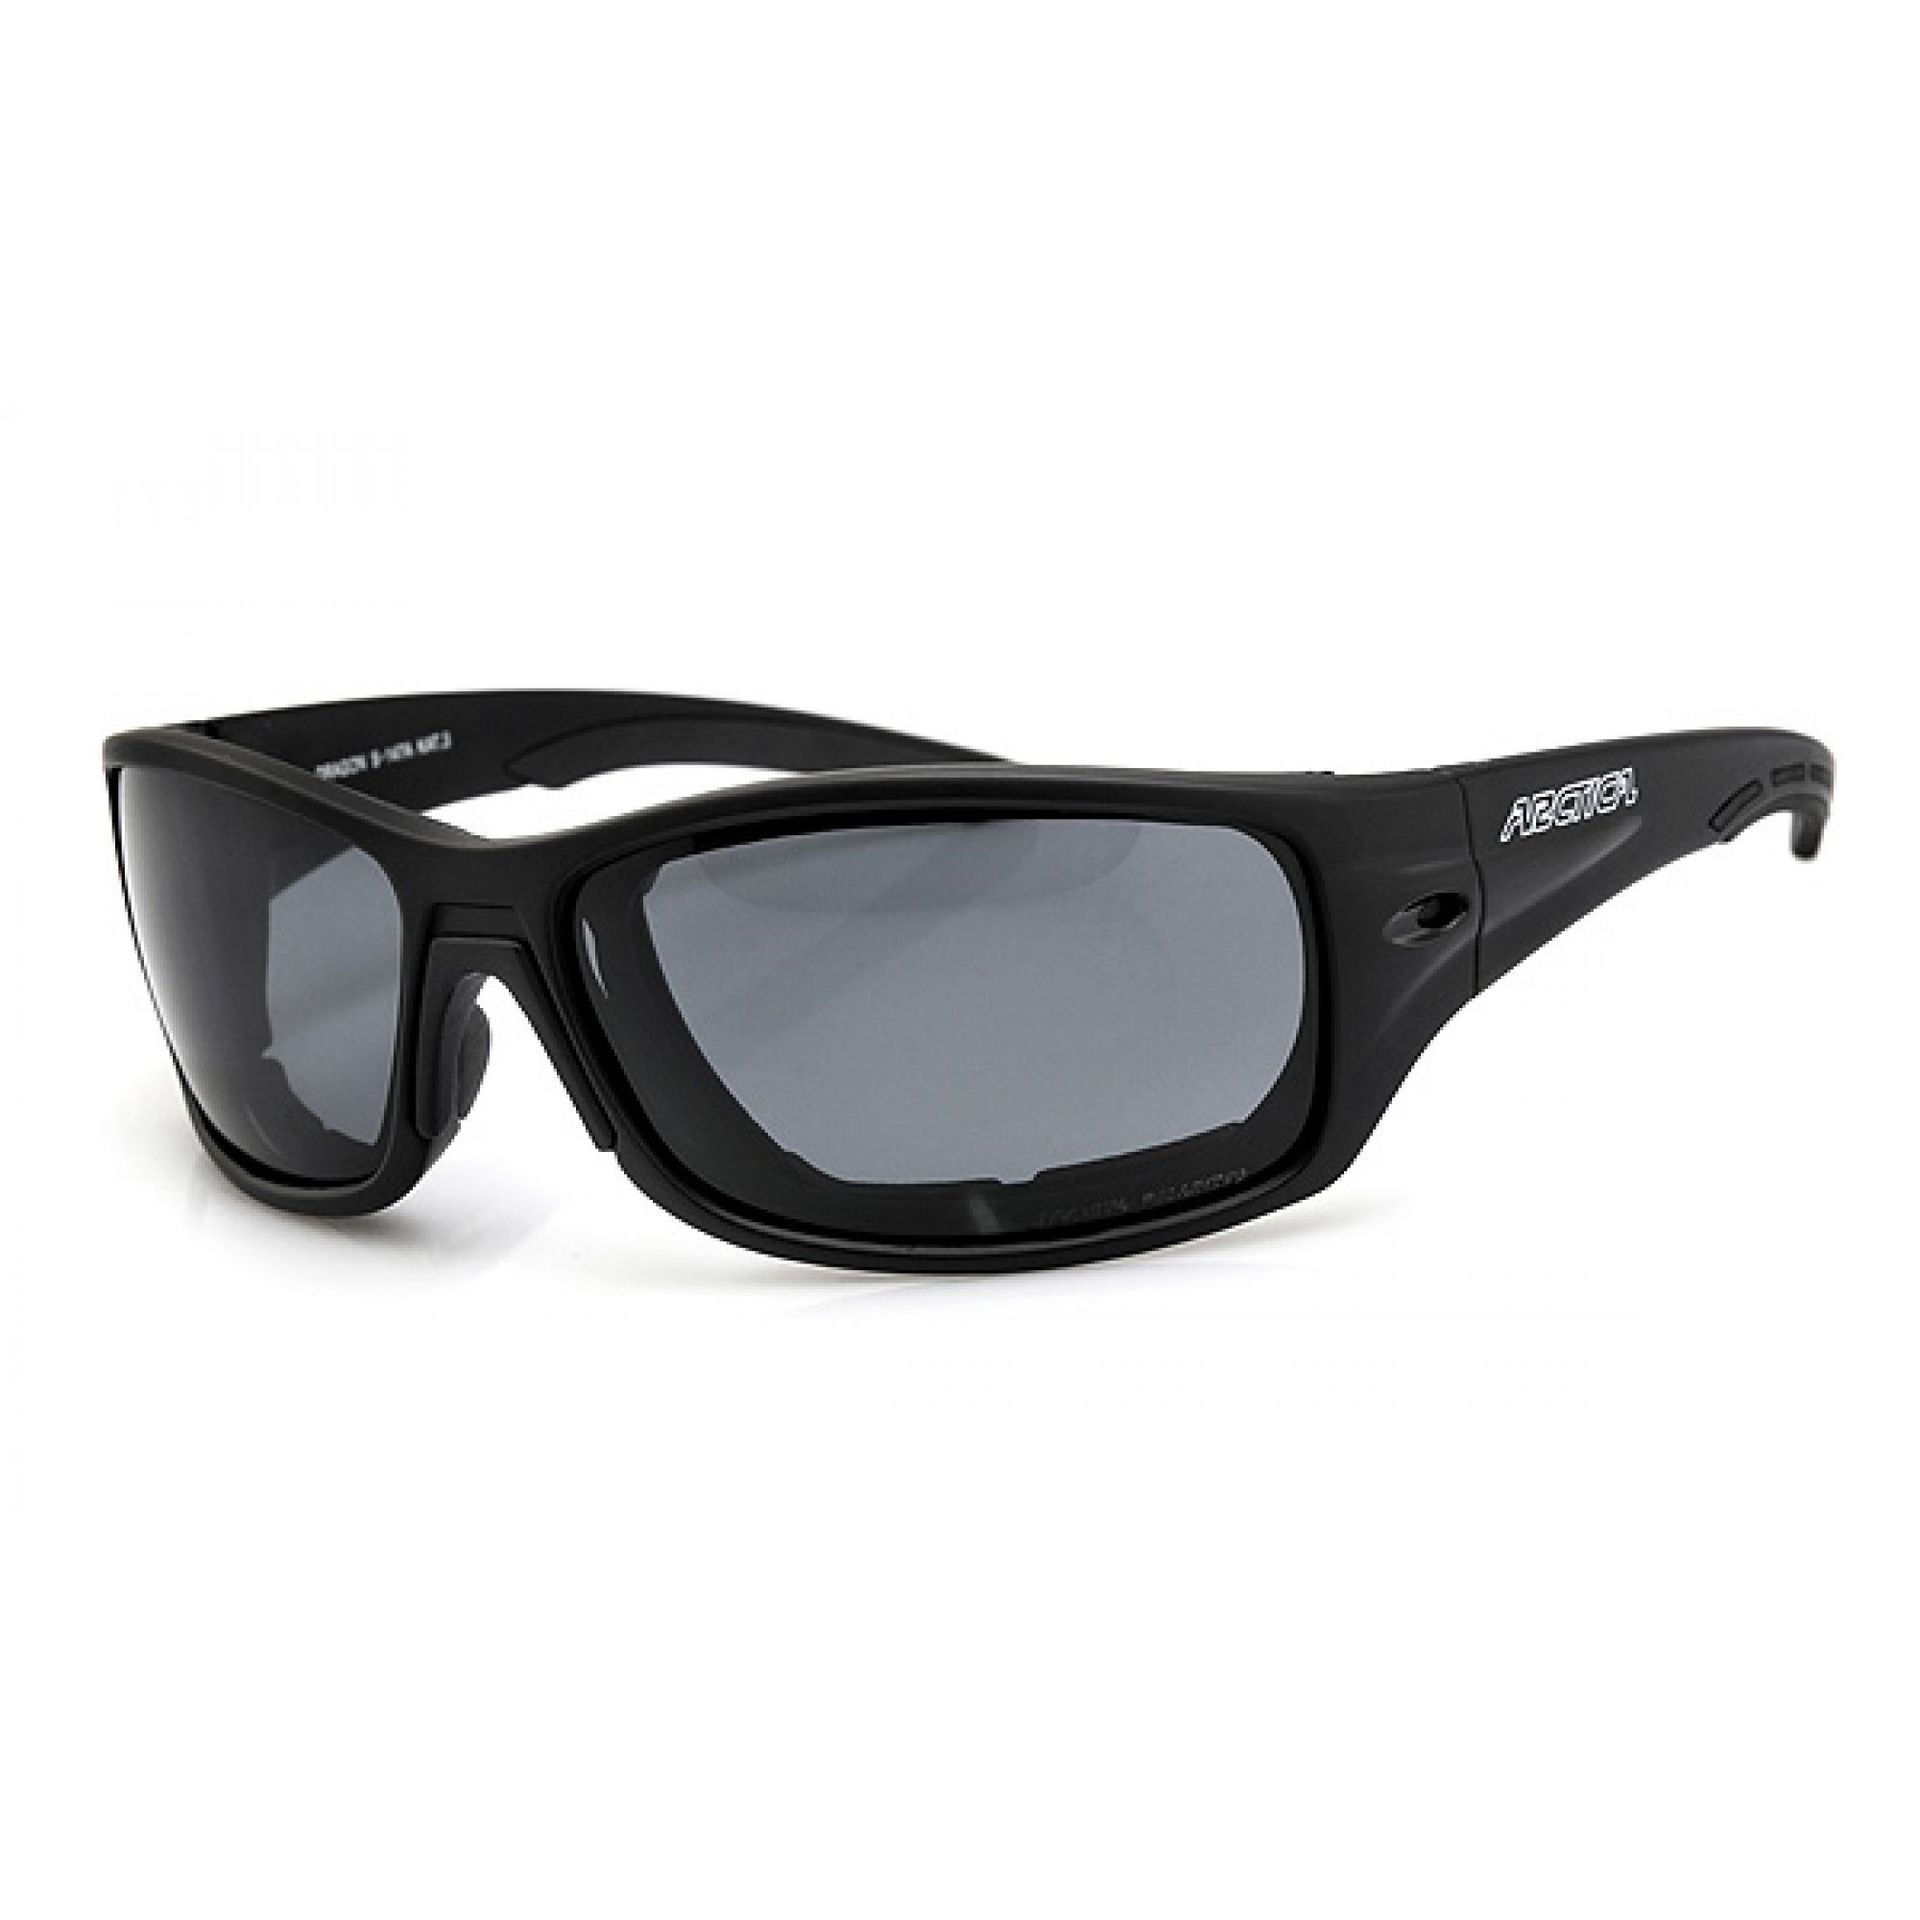 Okulary Arctica S-147A czarne